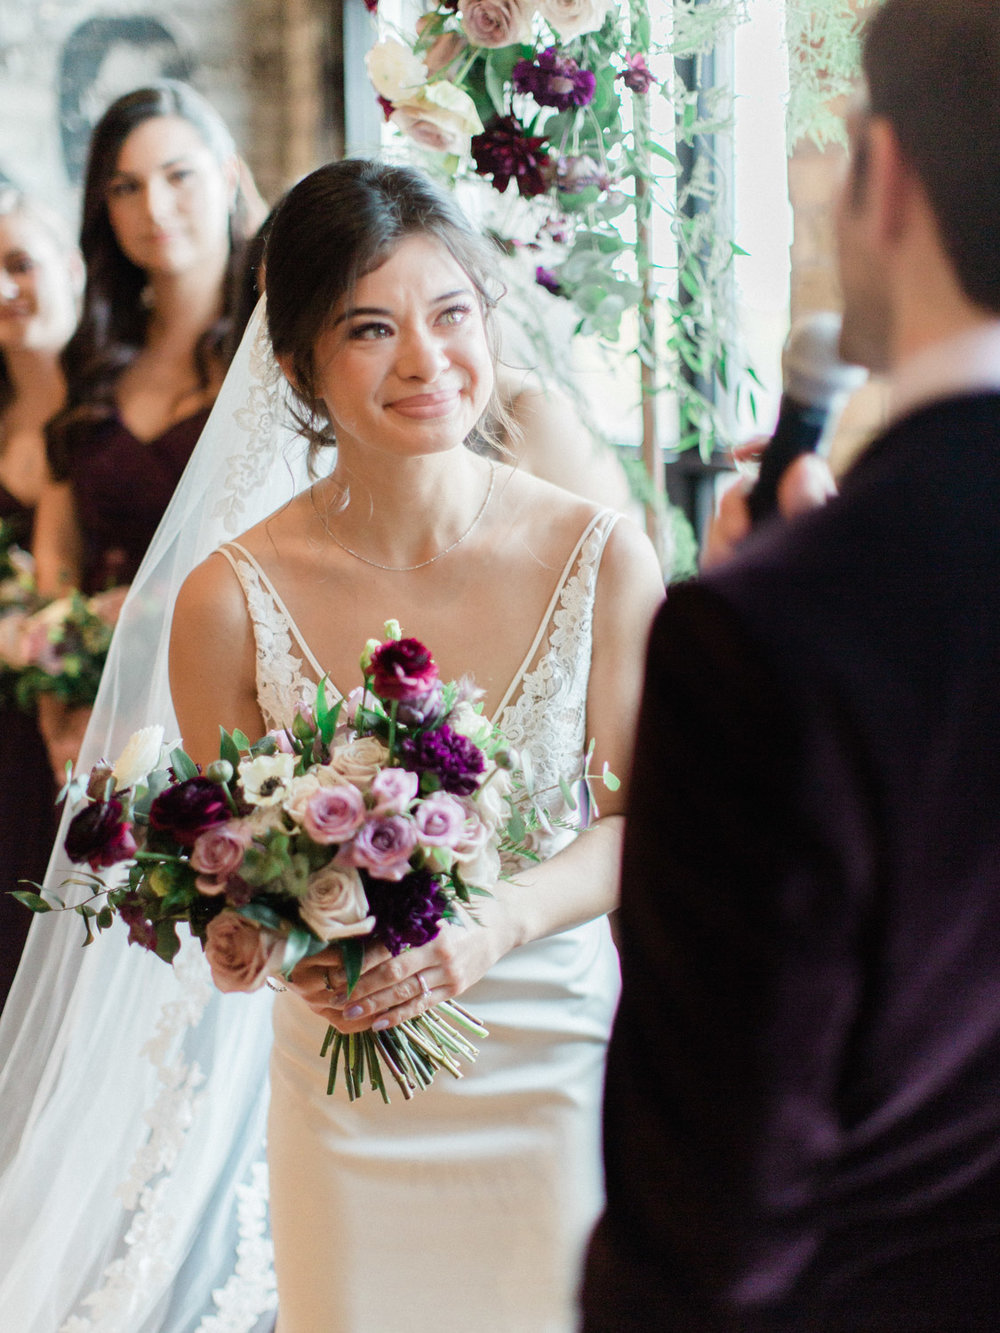 Toronto-wedding-photographer-intimate-italian-the-burroughes-downtown89.jpg